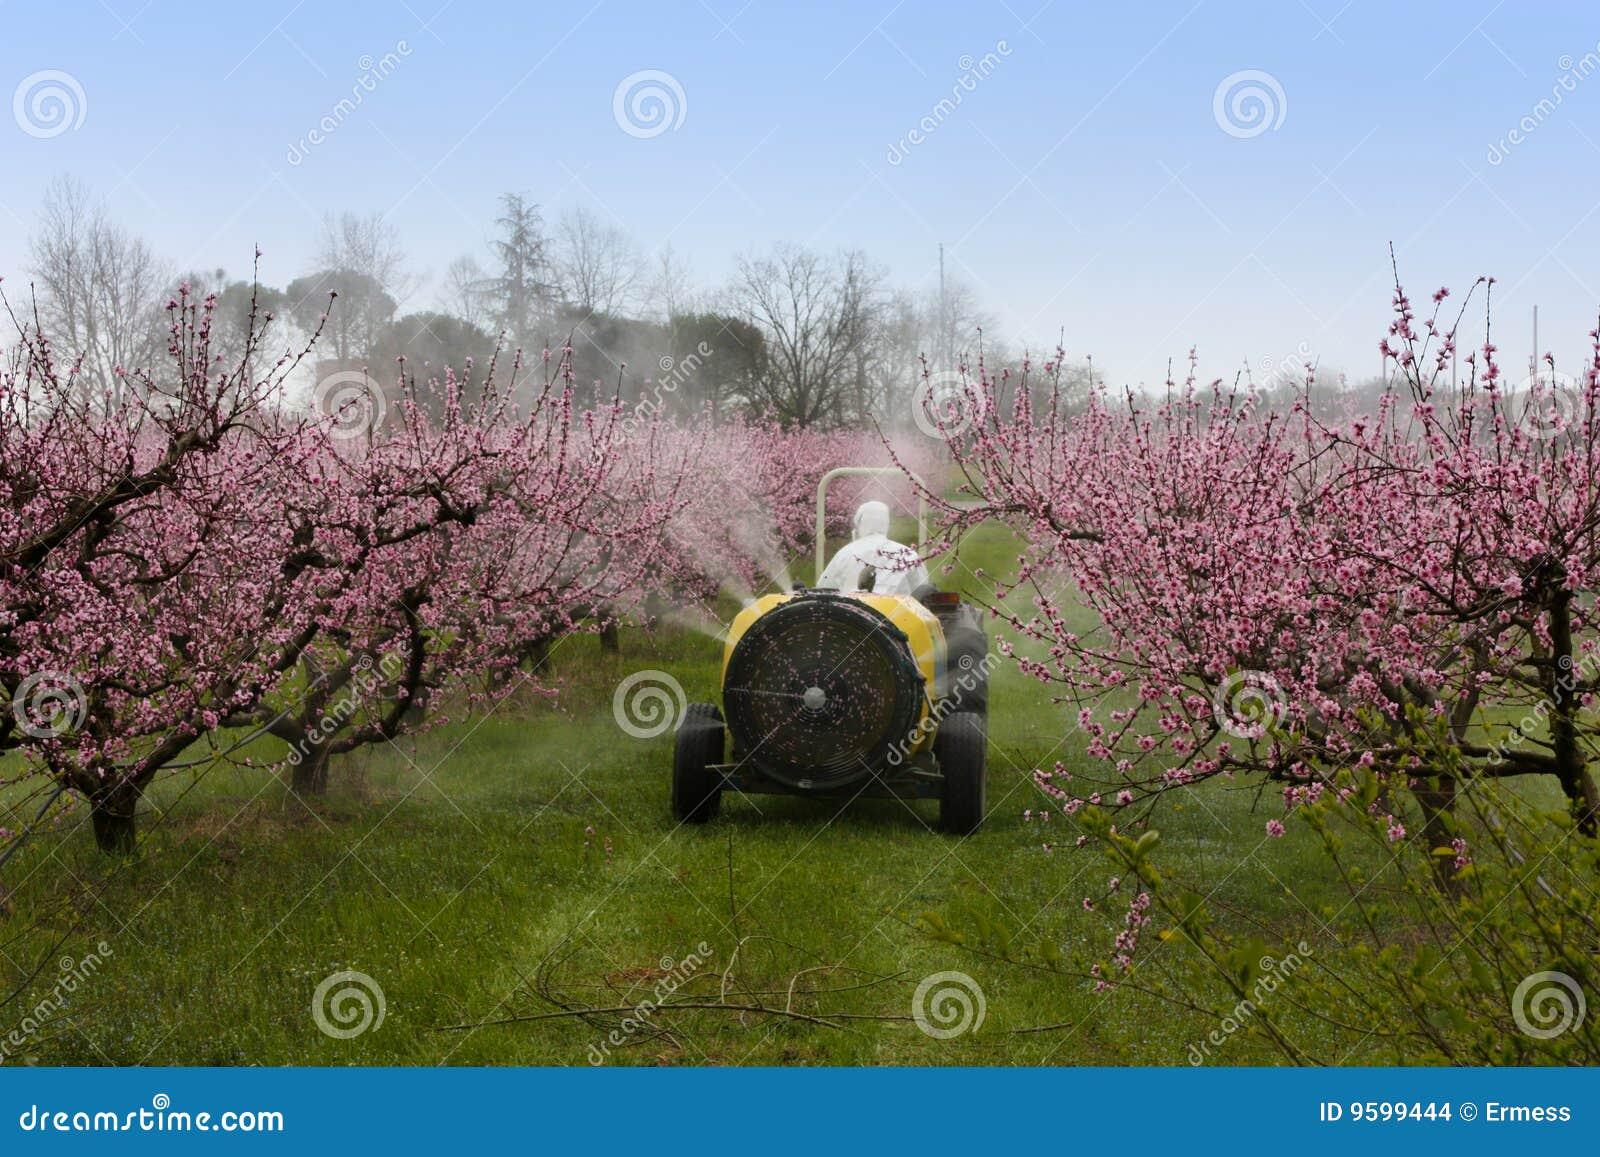 Spraying of peach